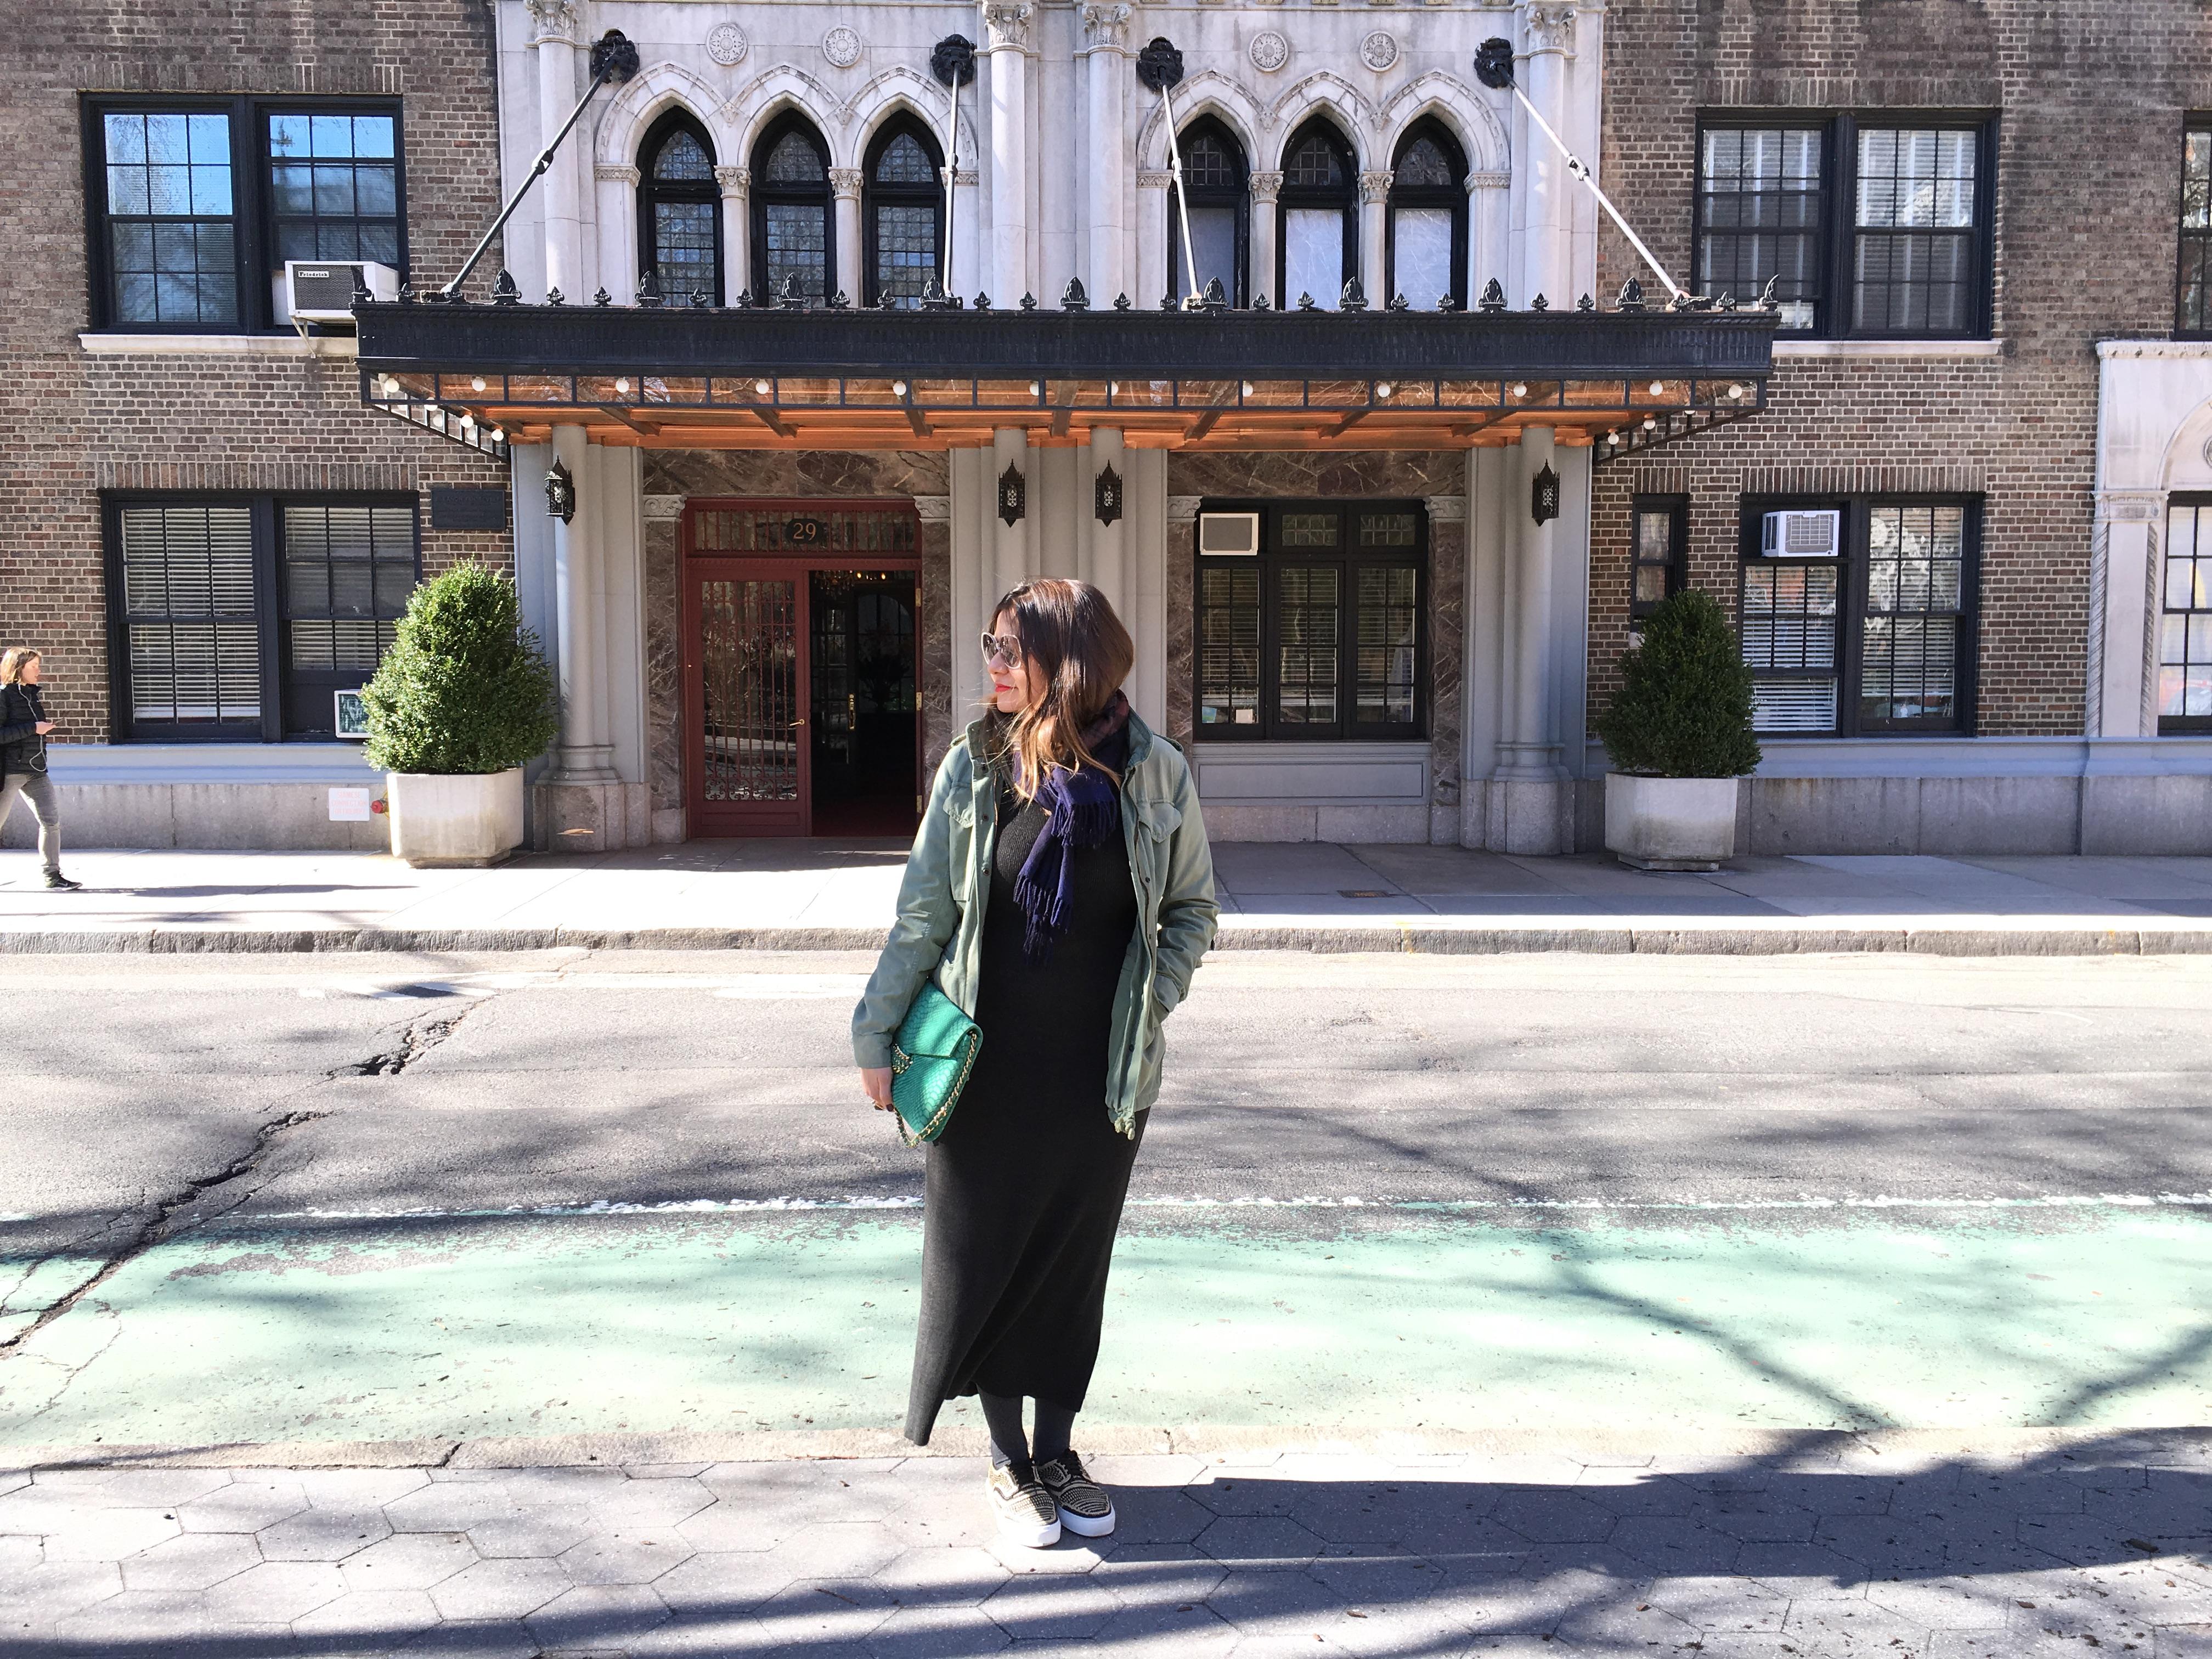 casul_chic_dress_looks_alley_girl_new_york_fashion_blog13